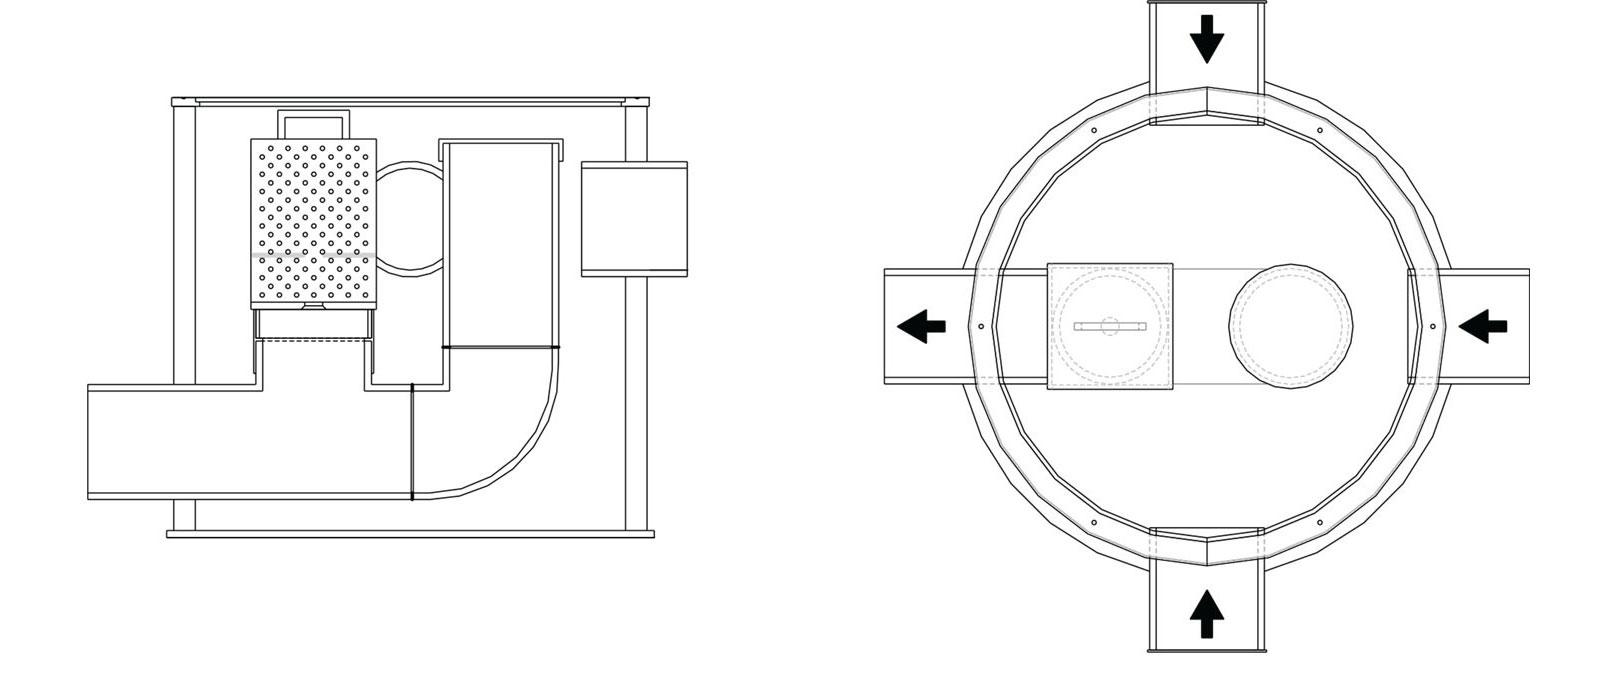 Controflow SUDS03001 dimensions